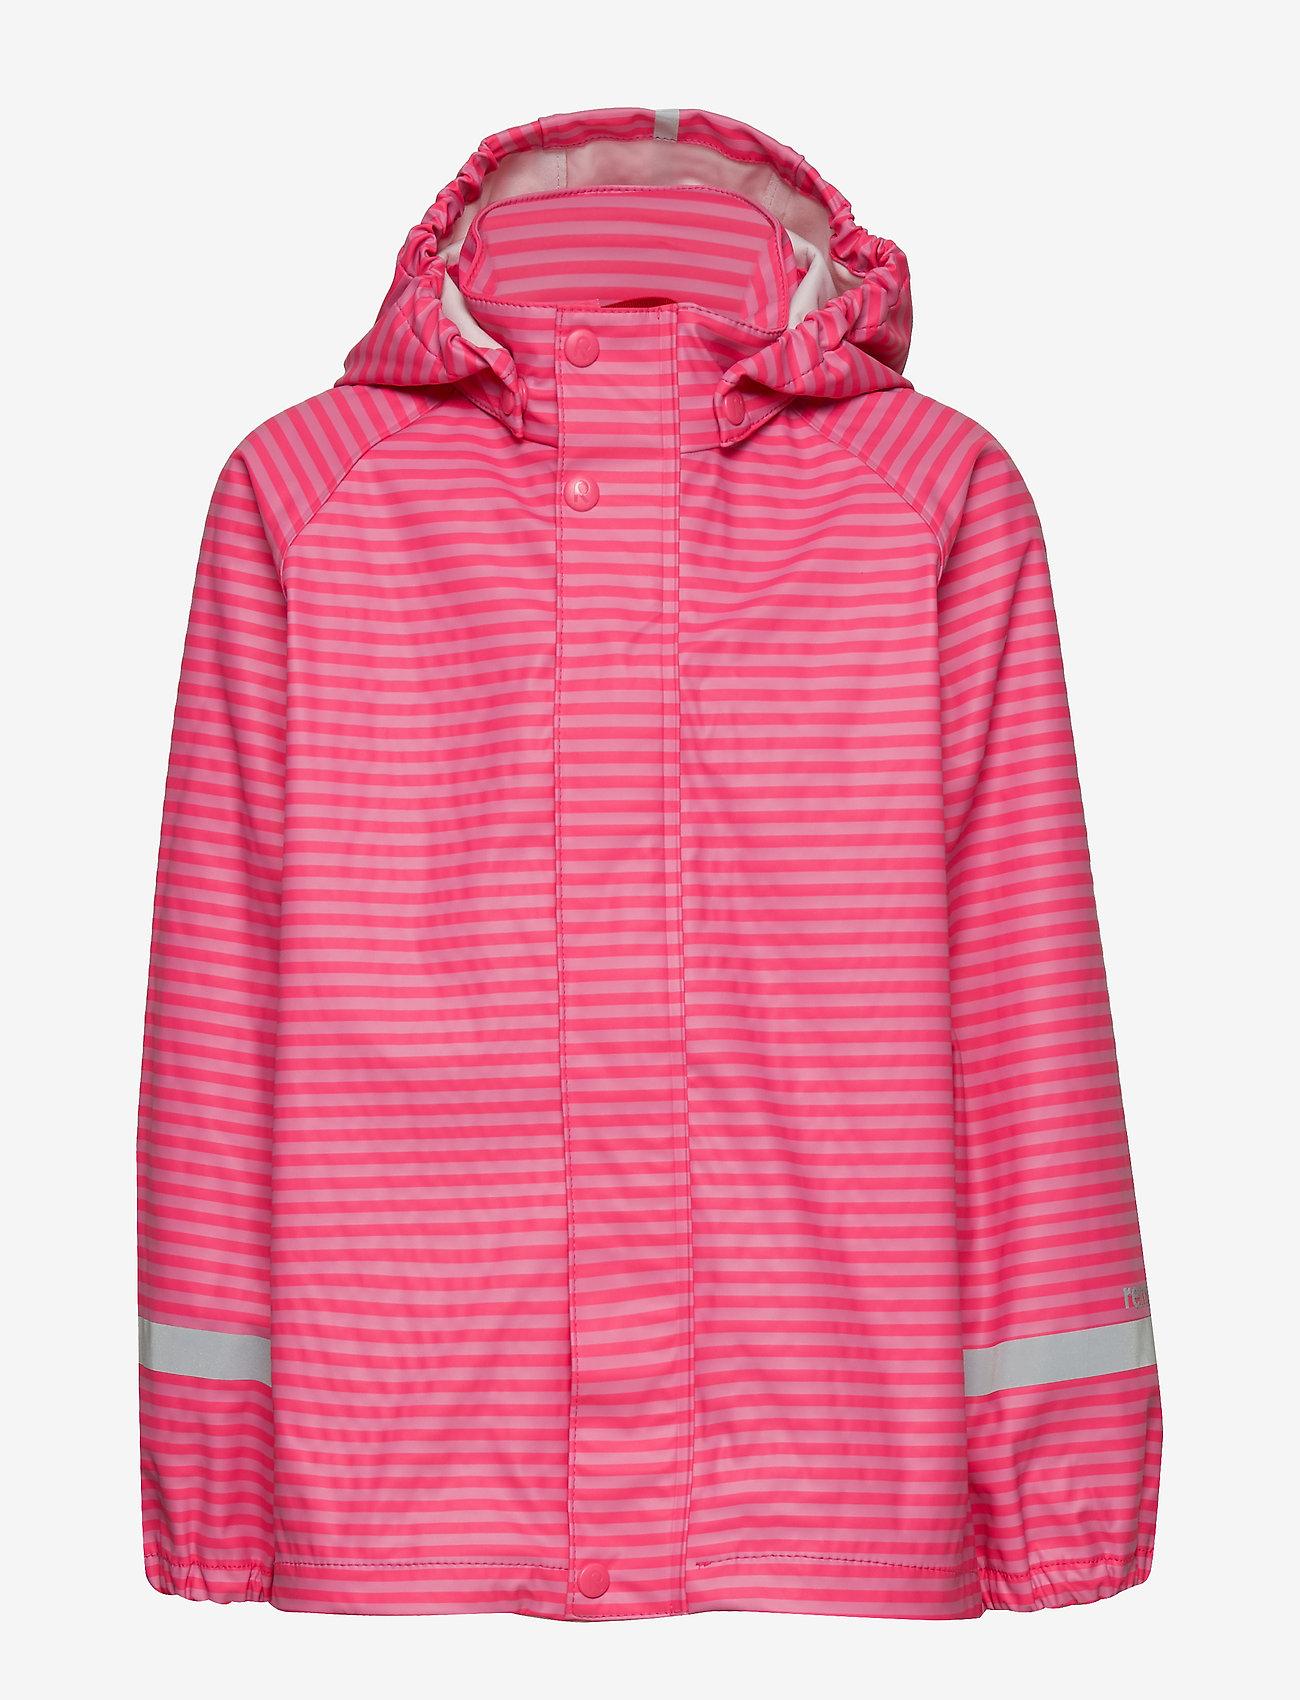 Reima - Vesi - jassen - candy pink - 1